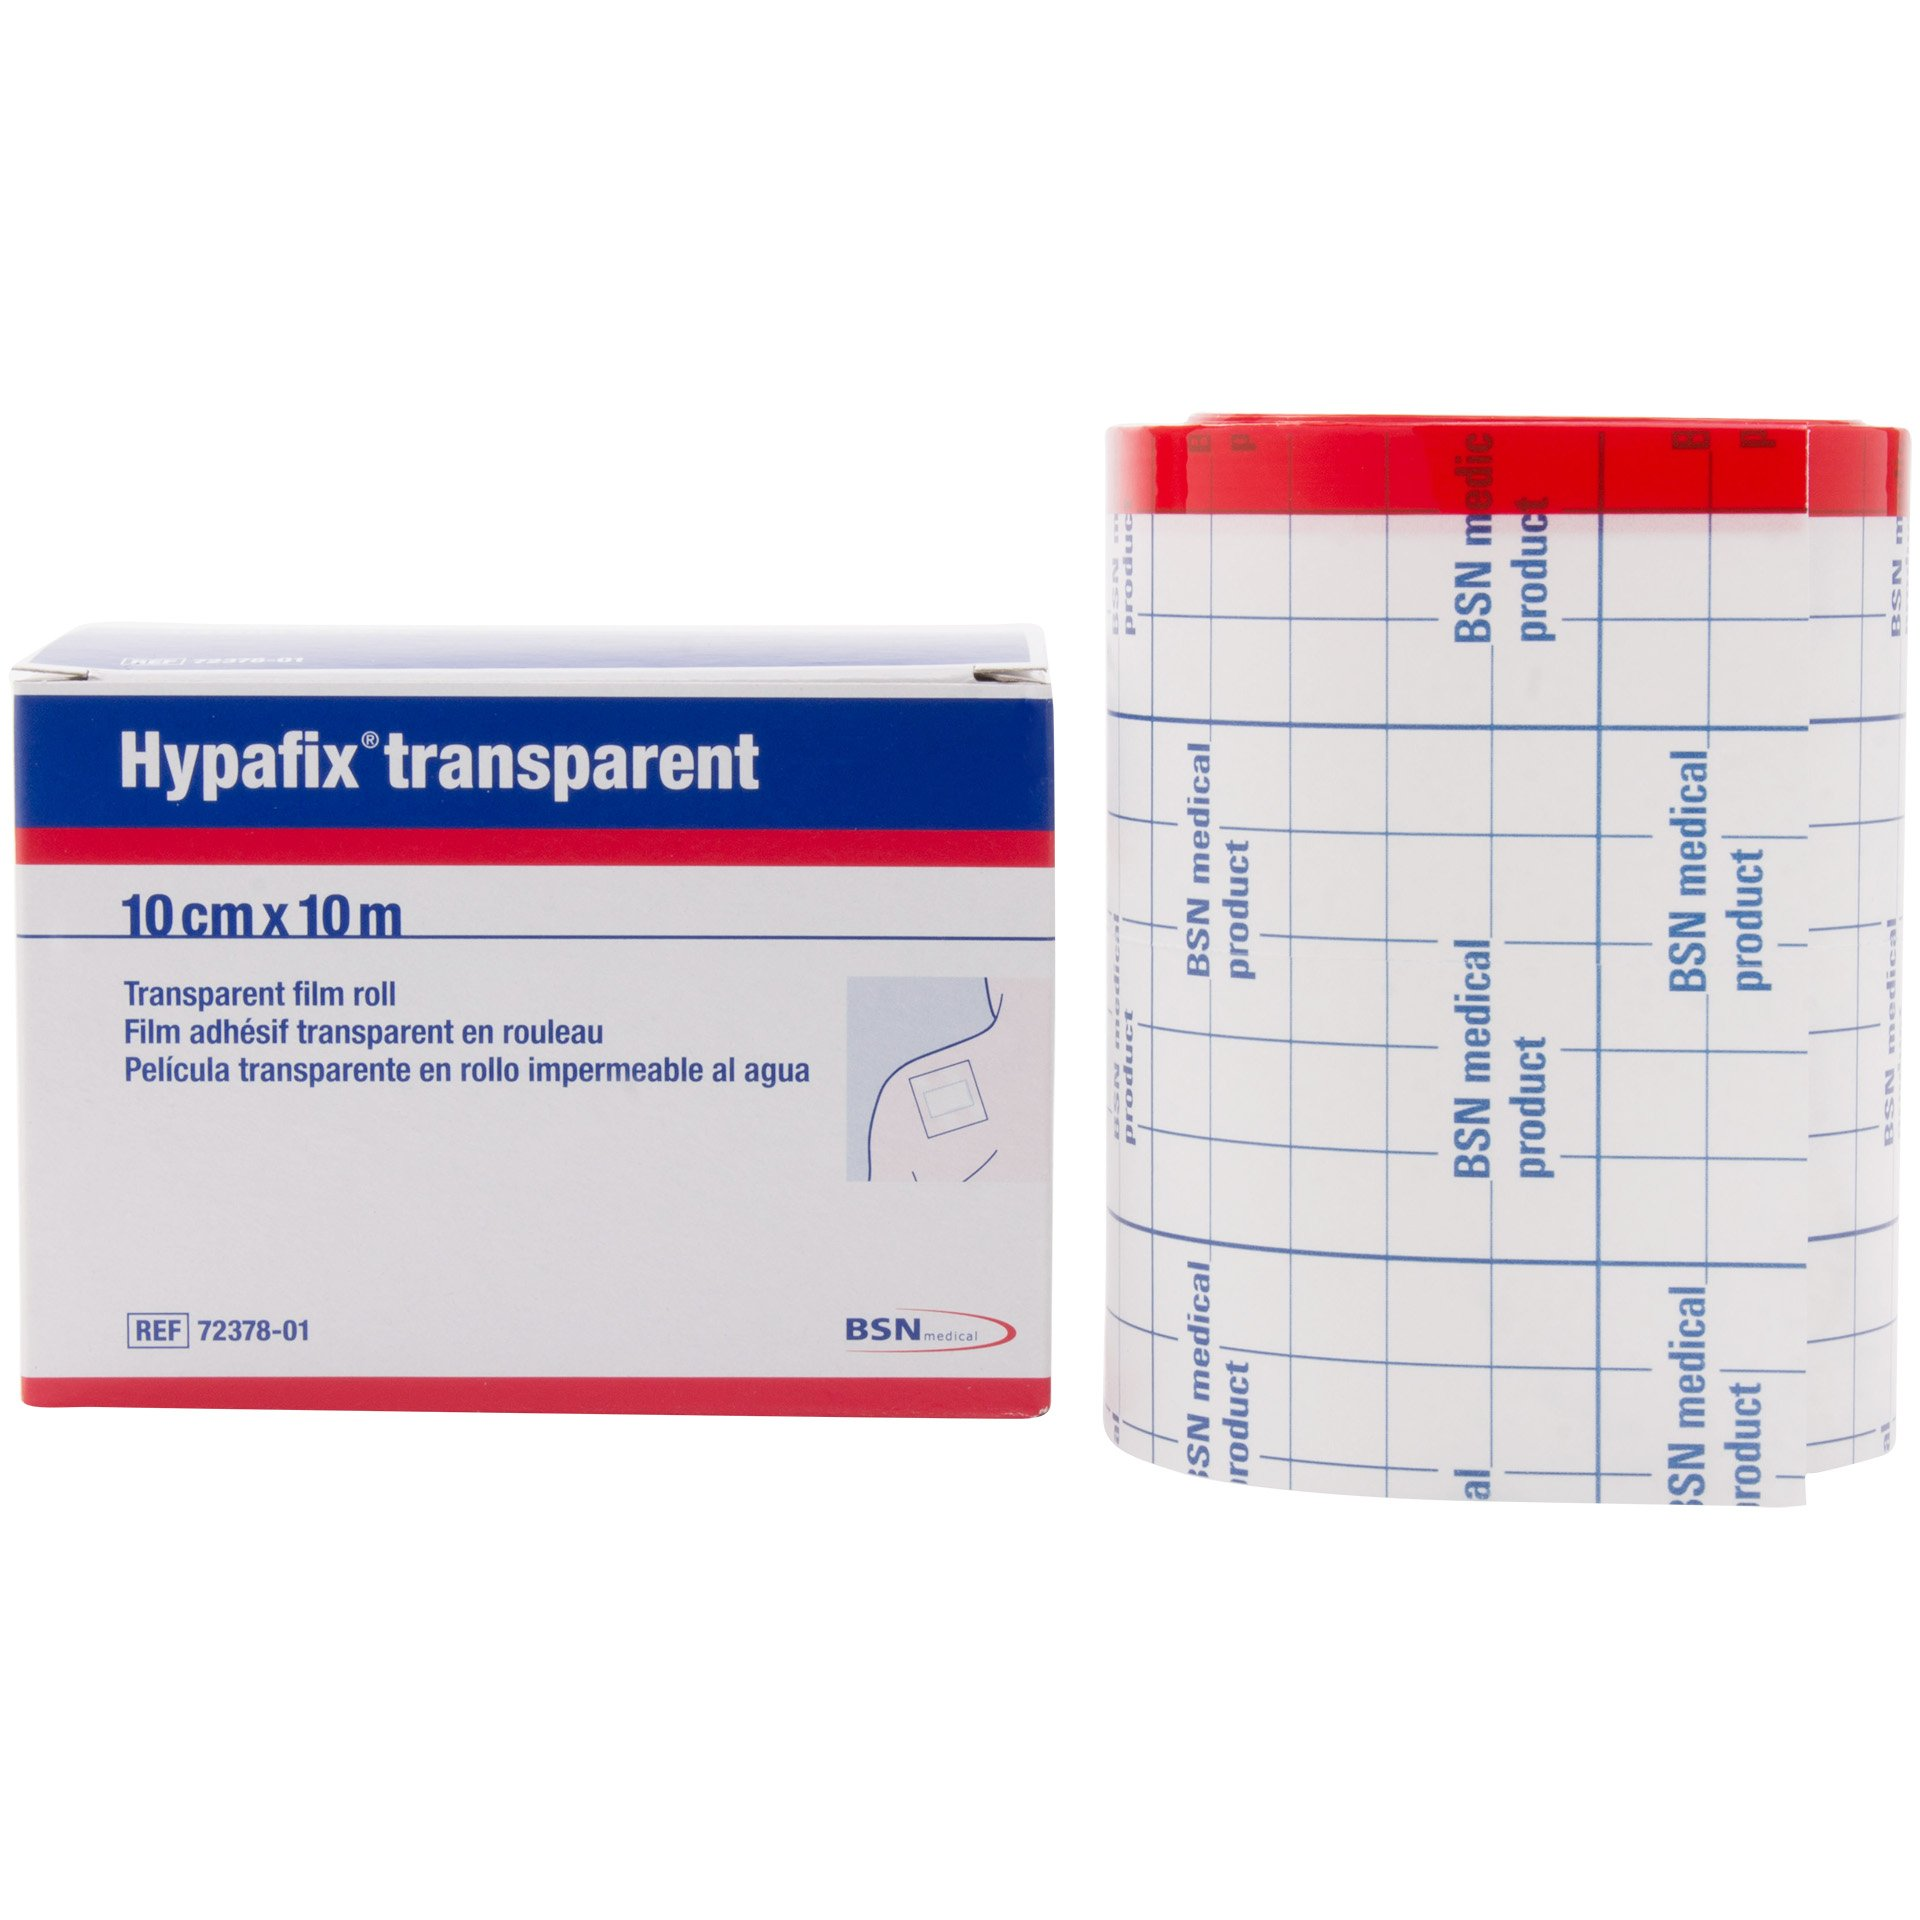 Hypafix® Transparent Film Dressing Roll - Waterproof (4'' X 11 yd roll) by Hypafix